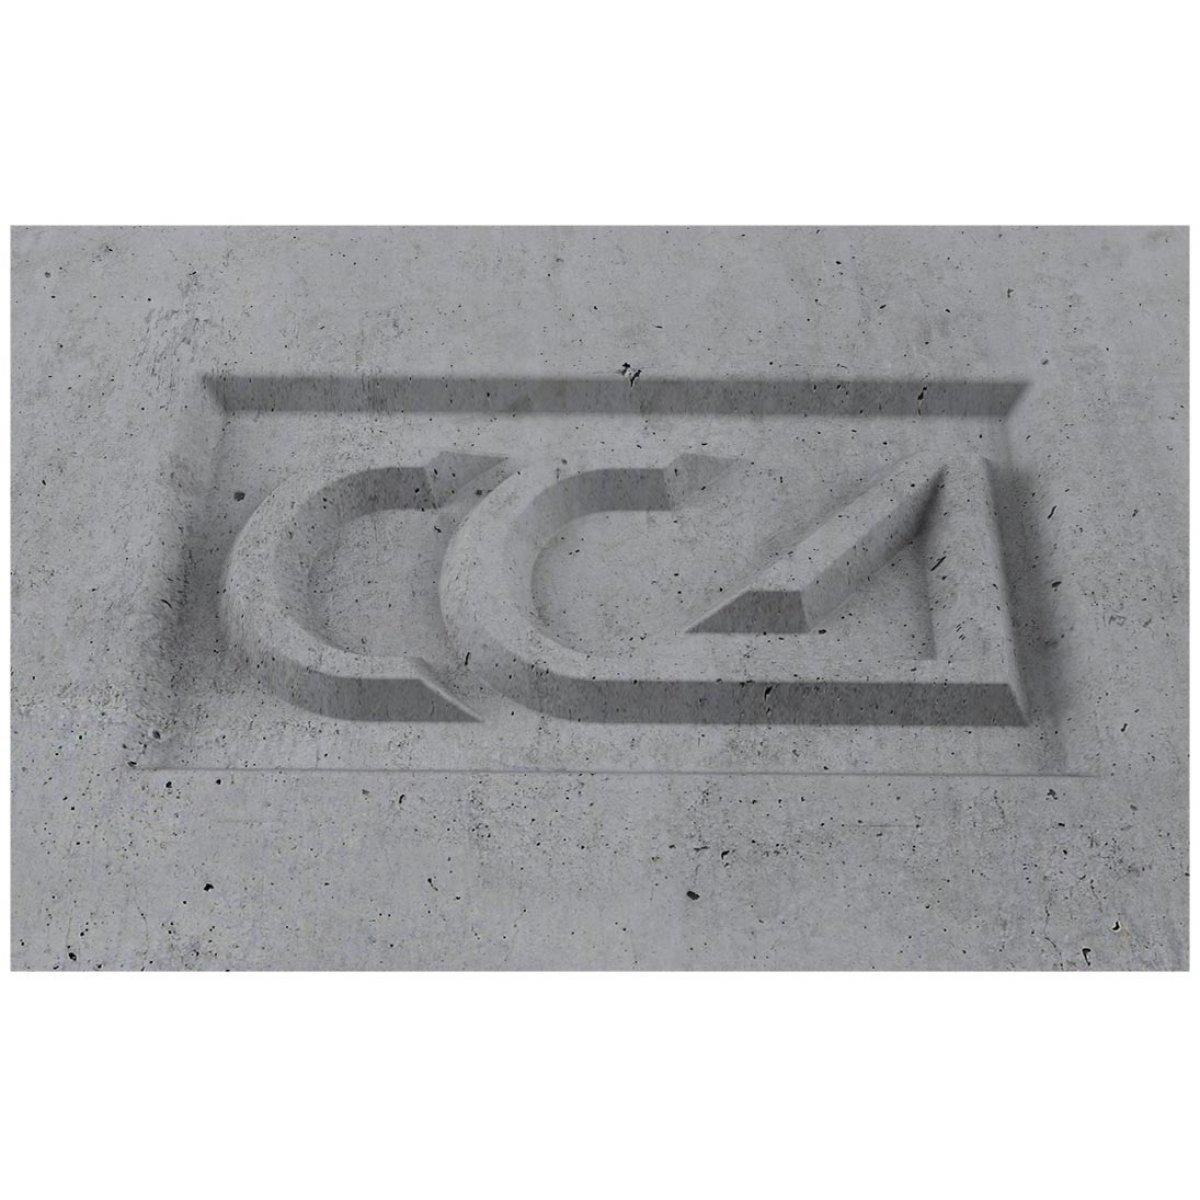 Колодец ККСр-2-10(80) ГЕК-ССД (В20)